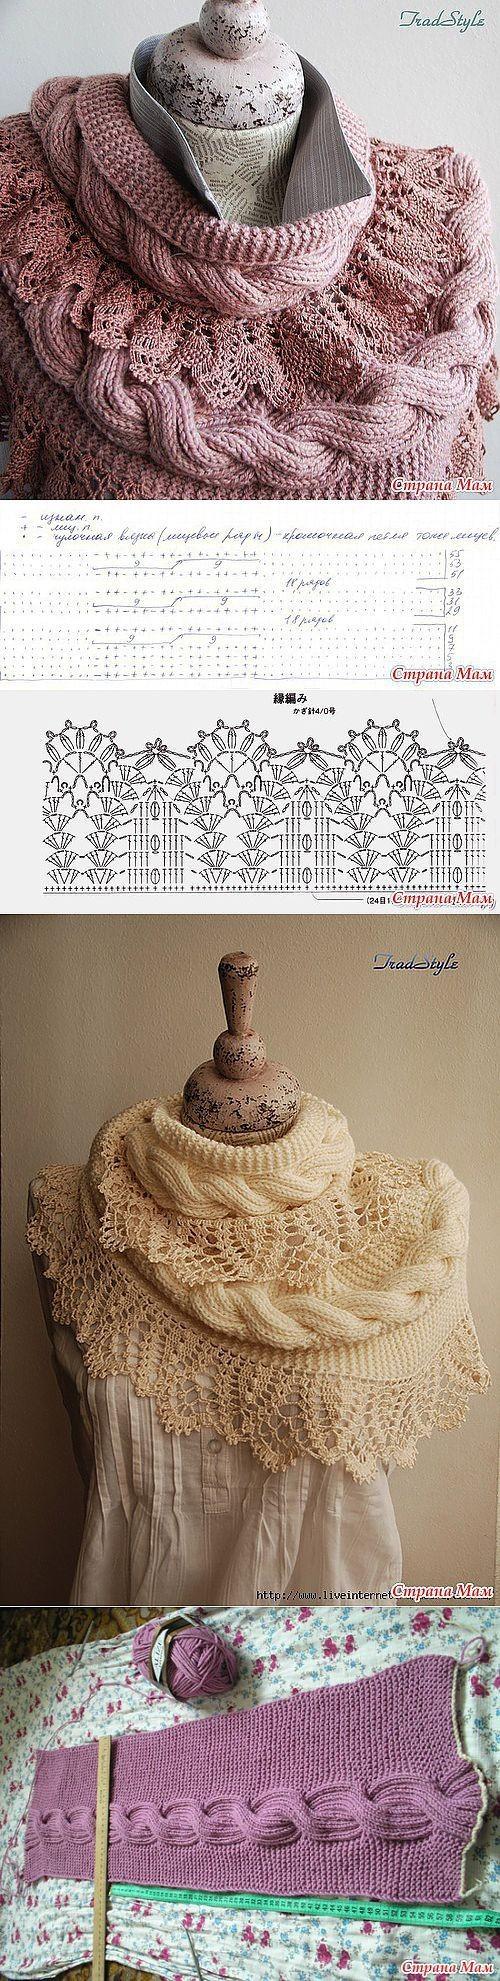 вязаный шарф, вязаное кружево, Вязаный край  красивый вязаный край узор вязание , вязаный фестон,  вязаная кромка, вязаная рюша,